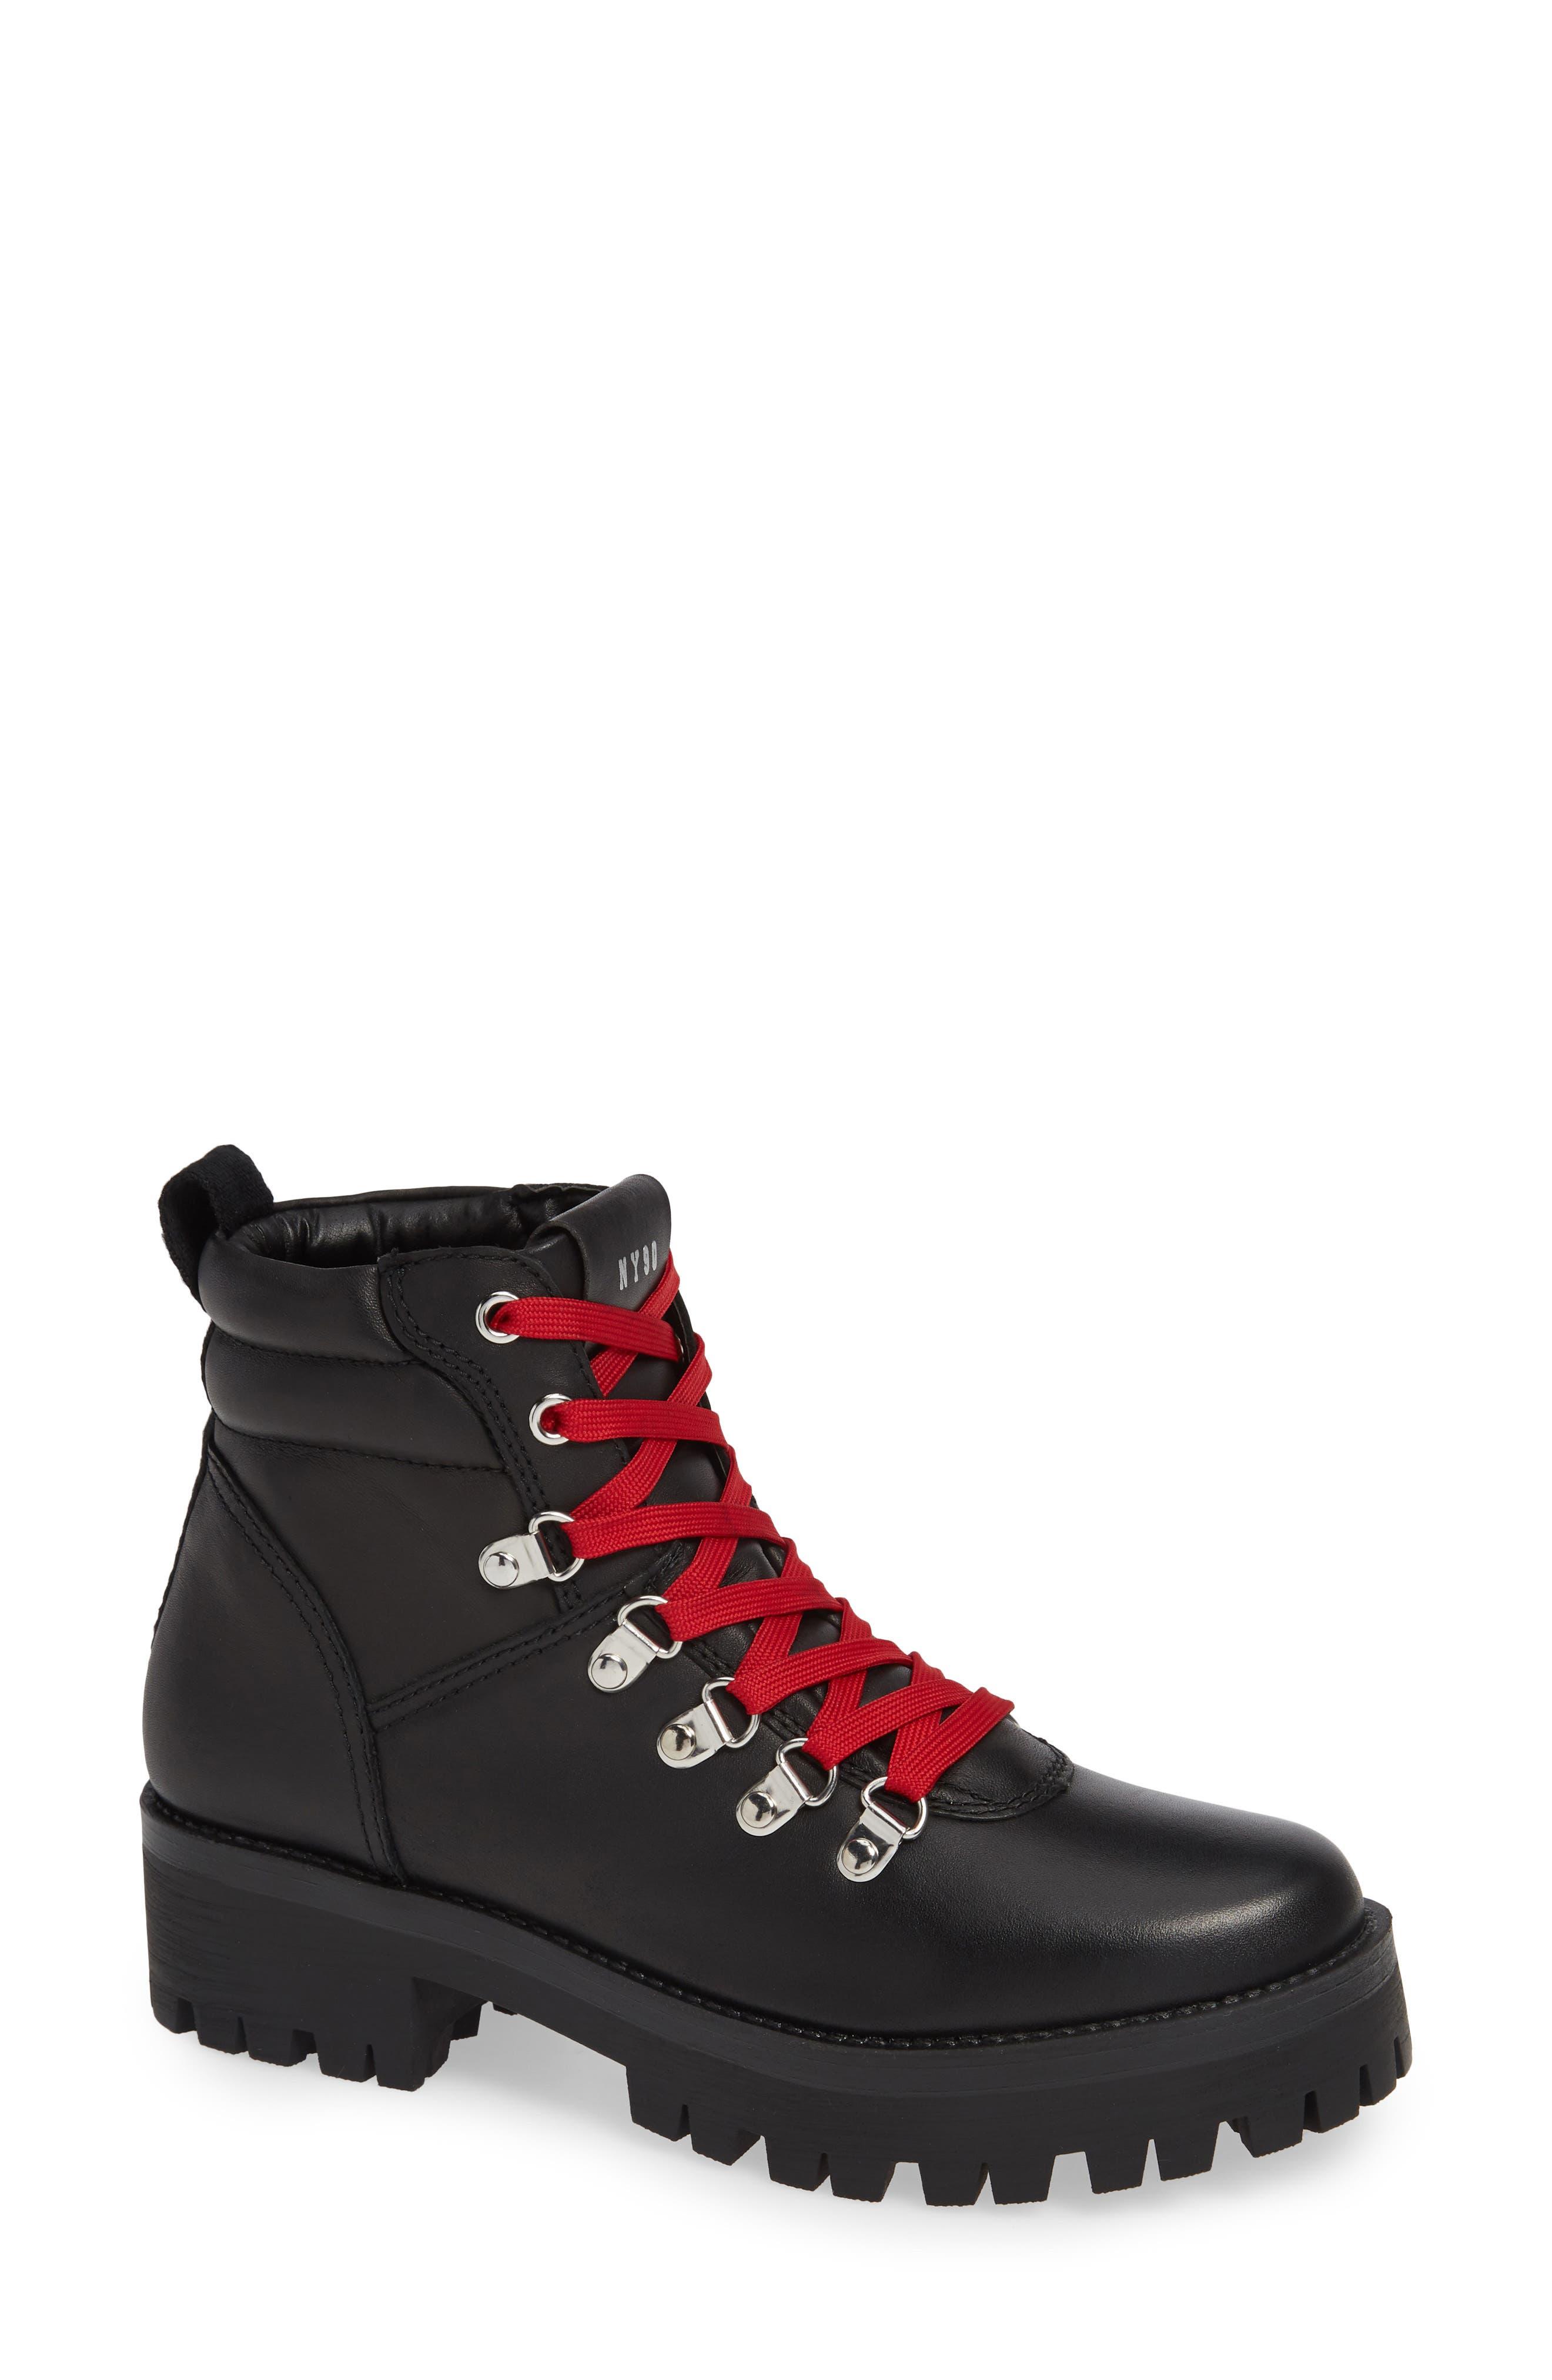 Buzzer Boot,                             Main thumbnail 1, color,                             BLACK LEATHER